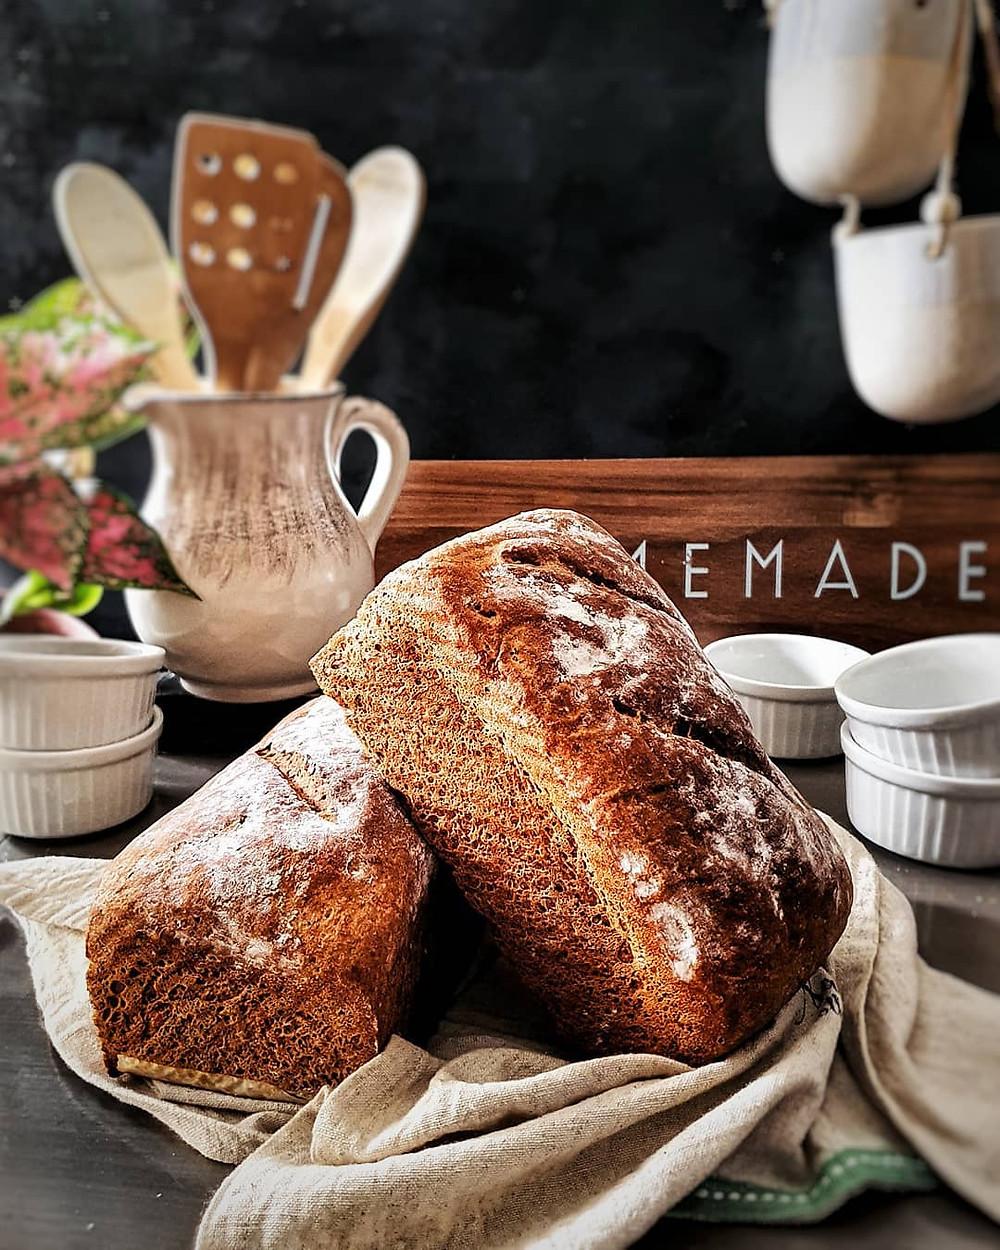 Gluten Free and Vegan Sandwich Loaf